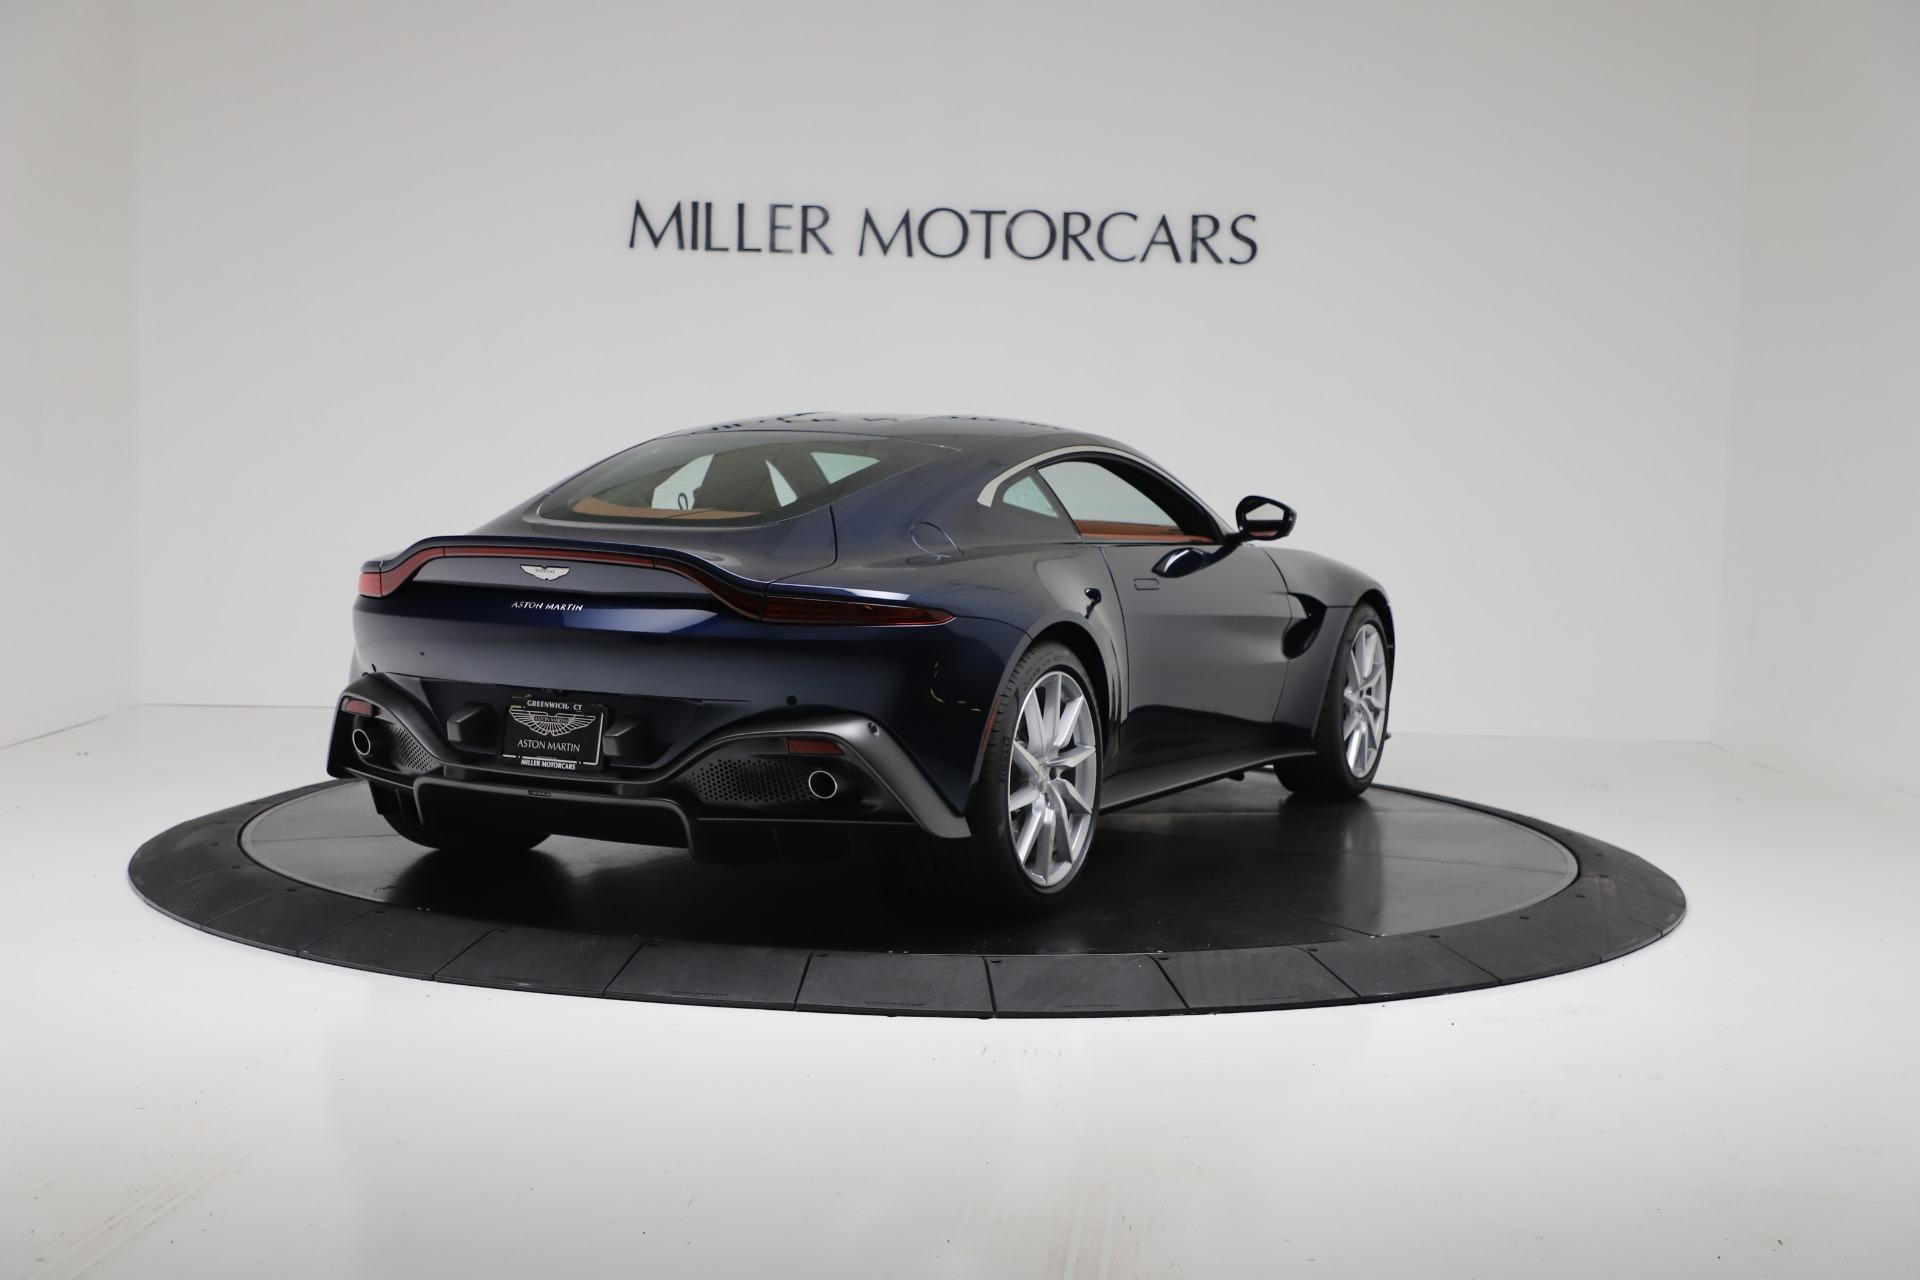 New 2020 Aston Martin Vantage V8 For Sale In Greenwich, CT 3378_p6